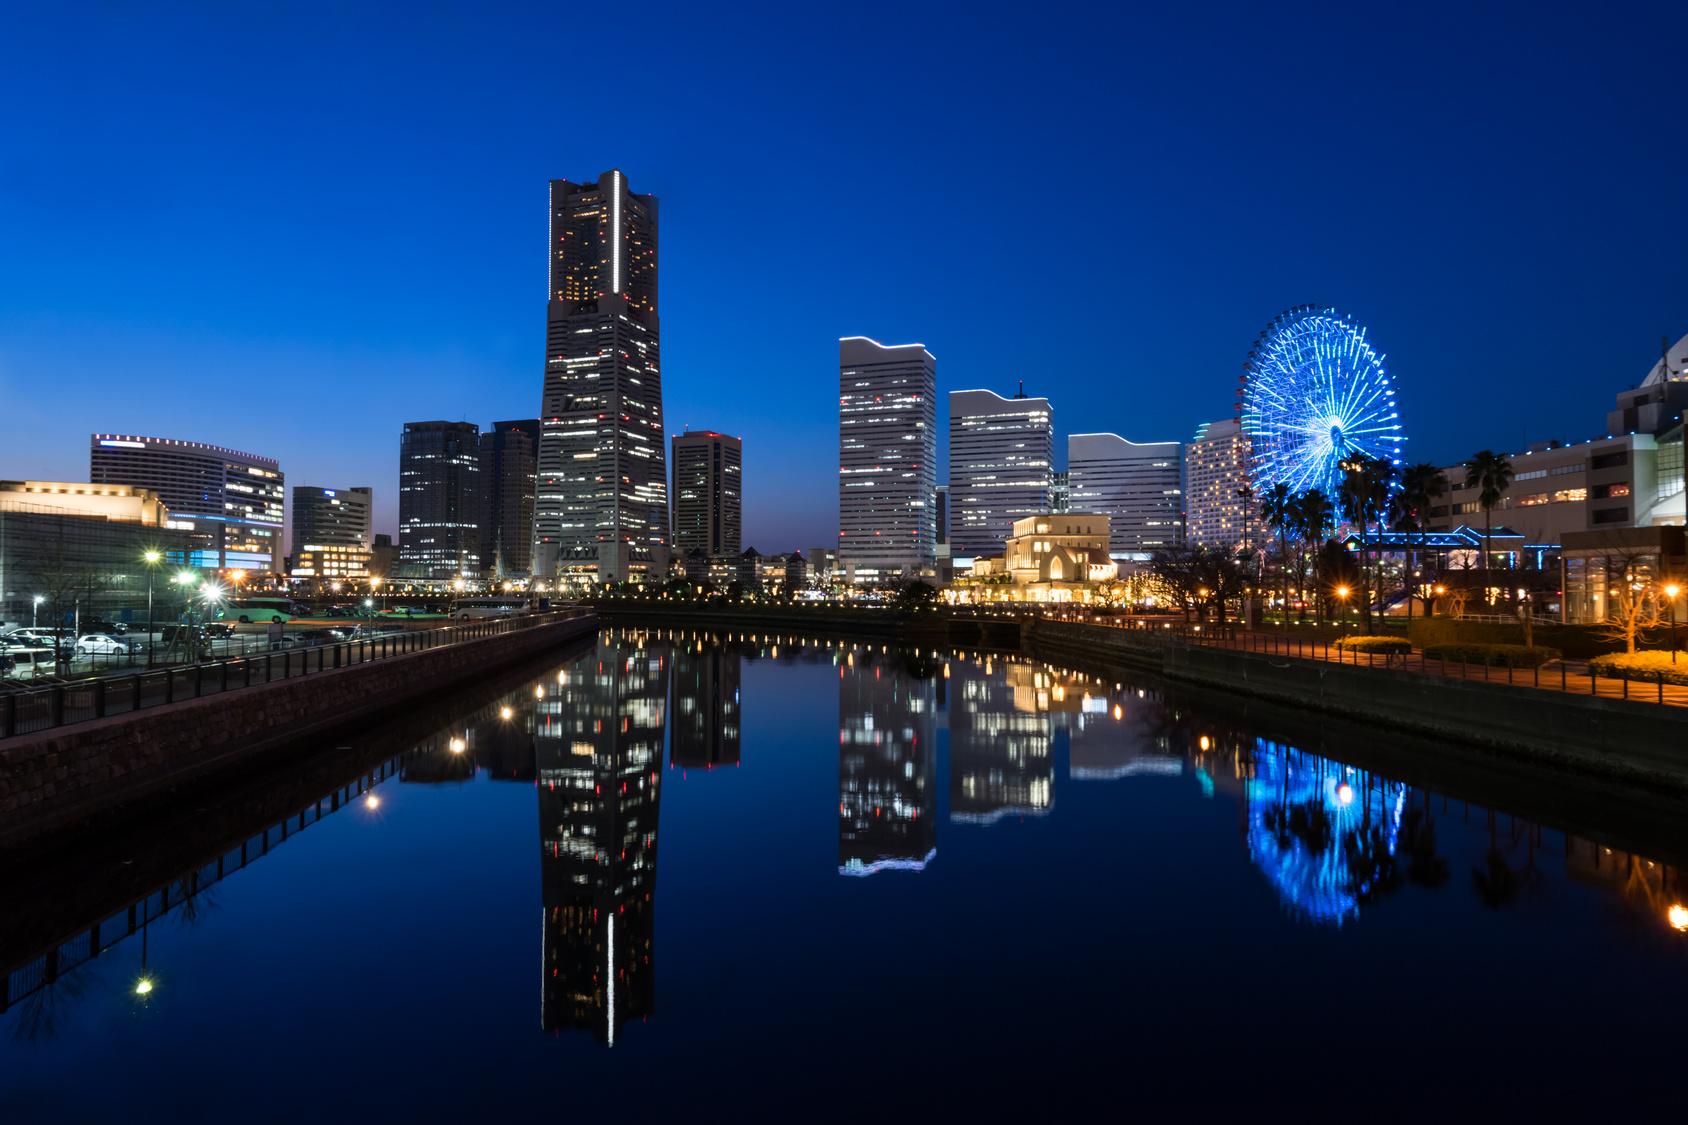 Cityscape of Minato Mirai area of Yokohama City at dusk () in Kanagawa, Japan.